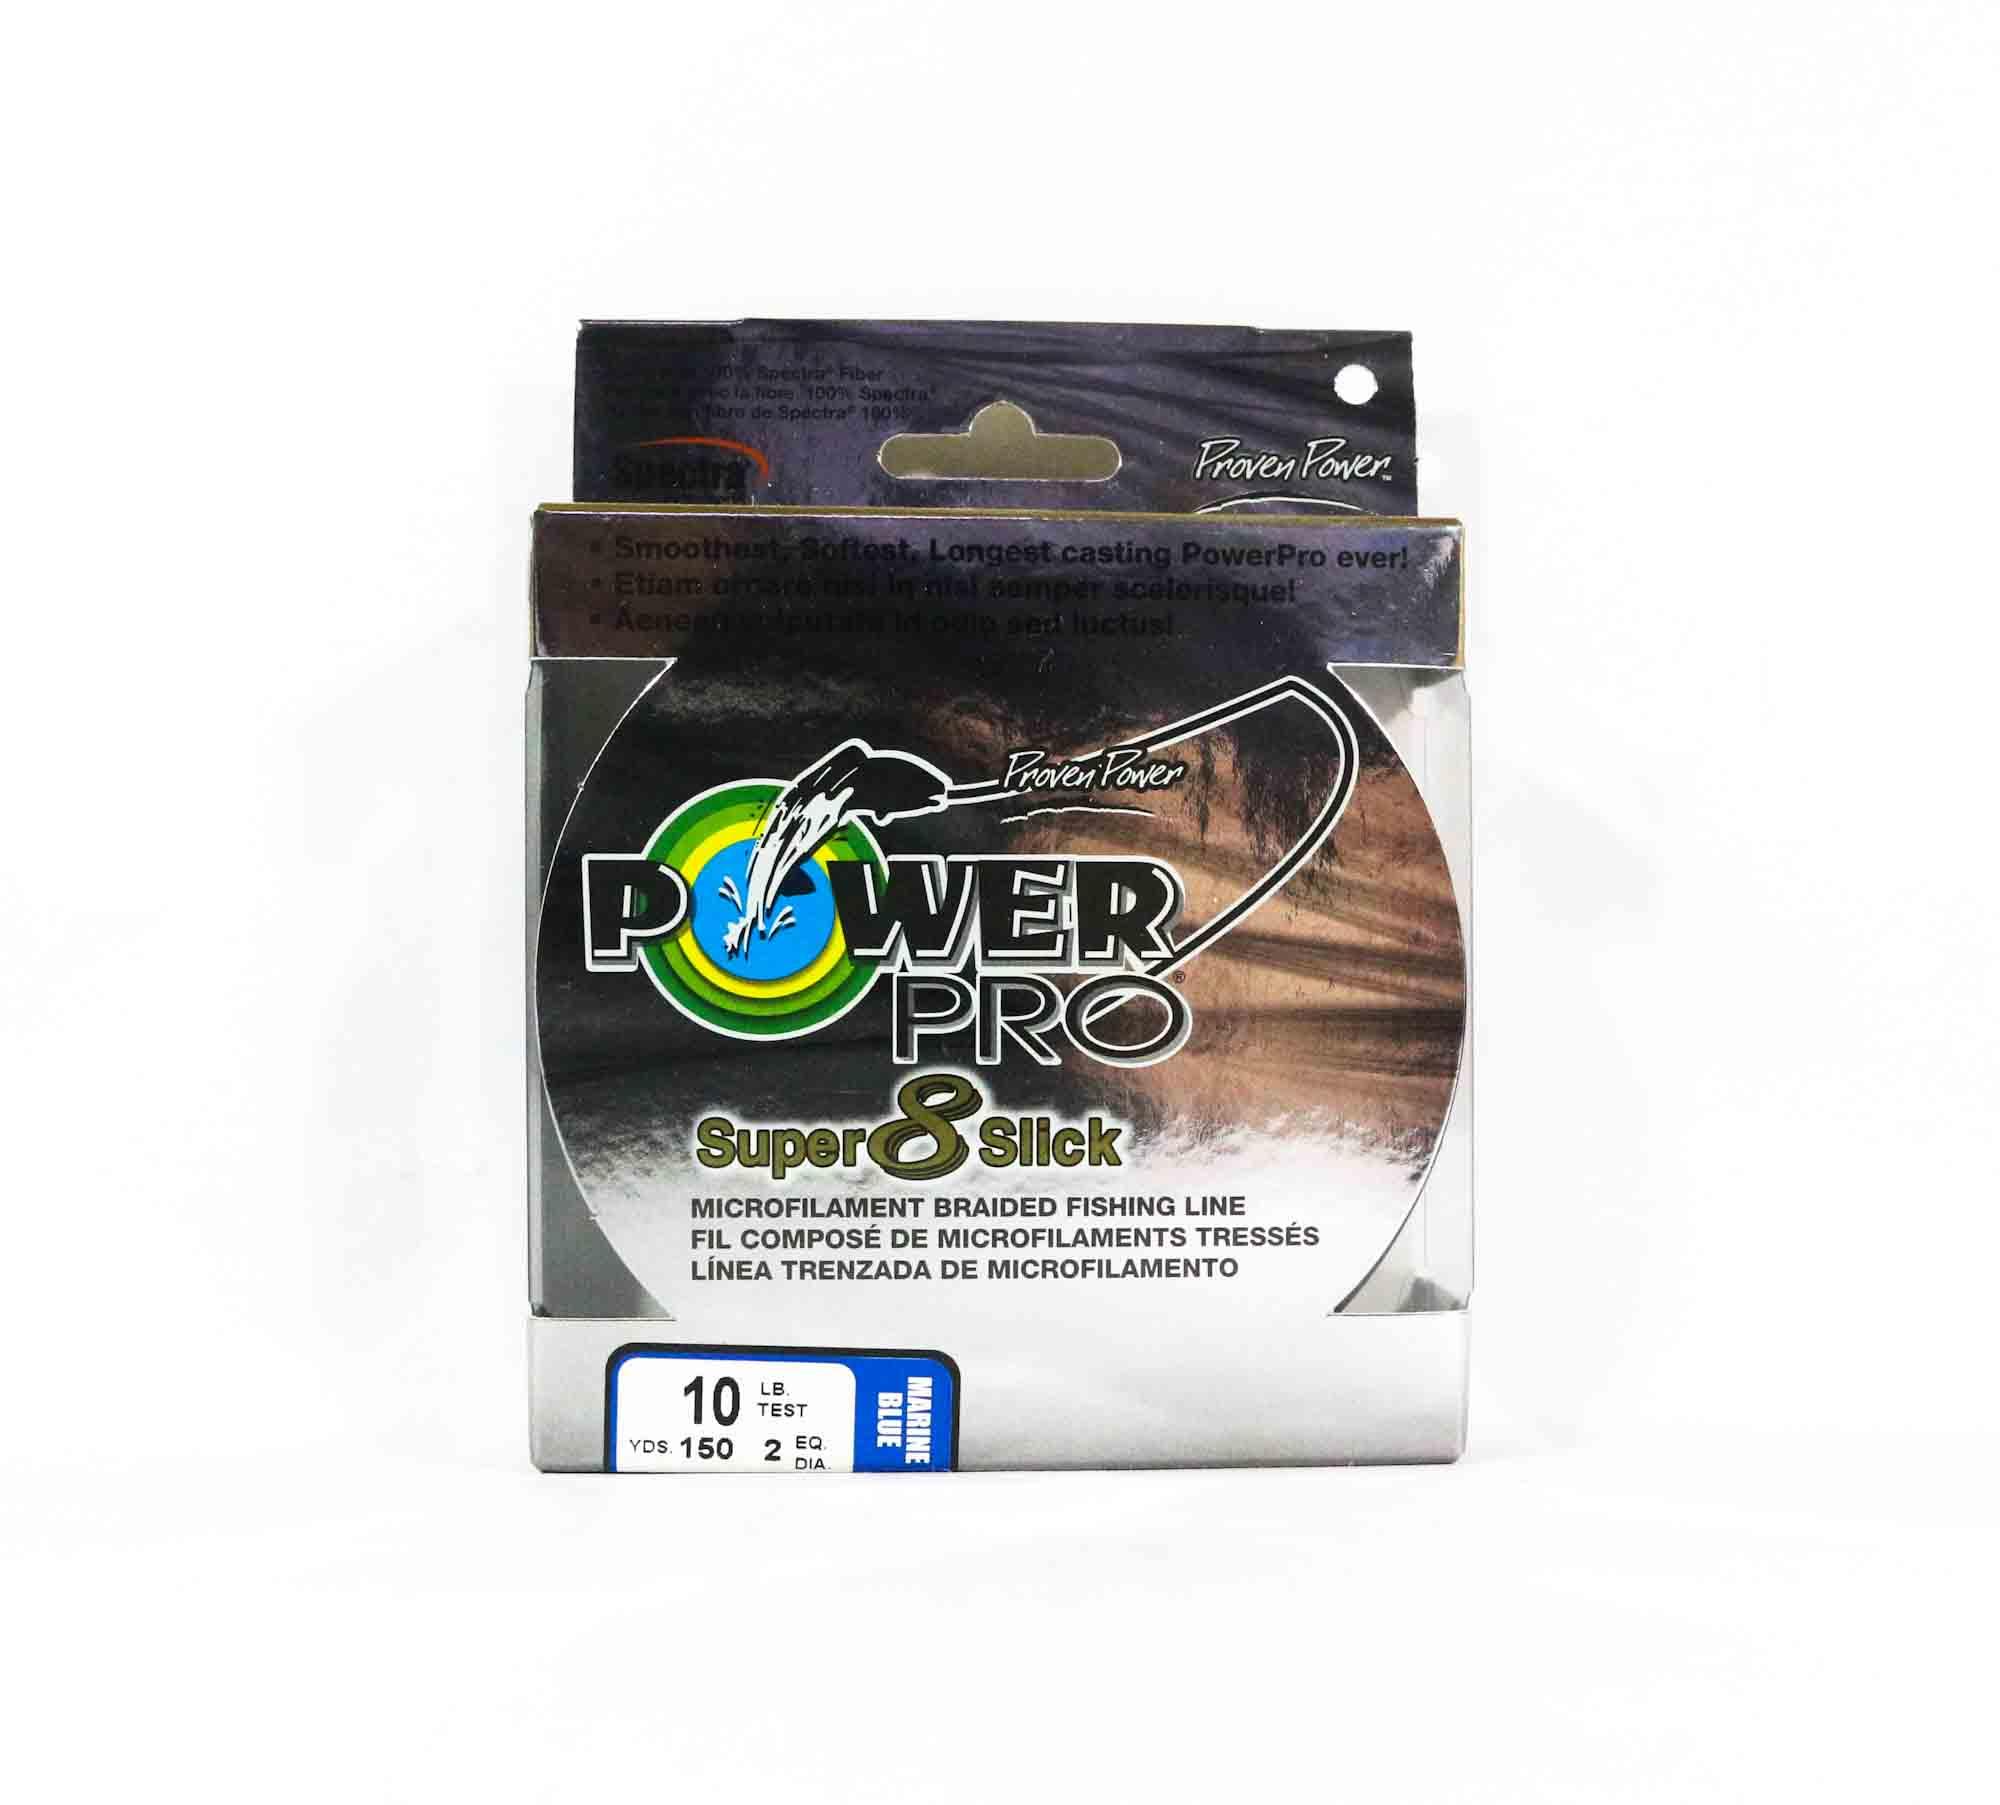 Power Pro Super 8 Slick Spectra Line 10lb by 150yds Blue (0138)